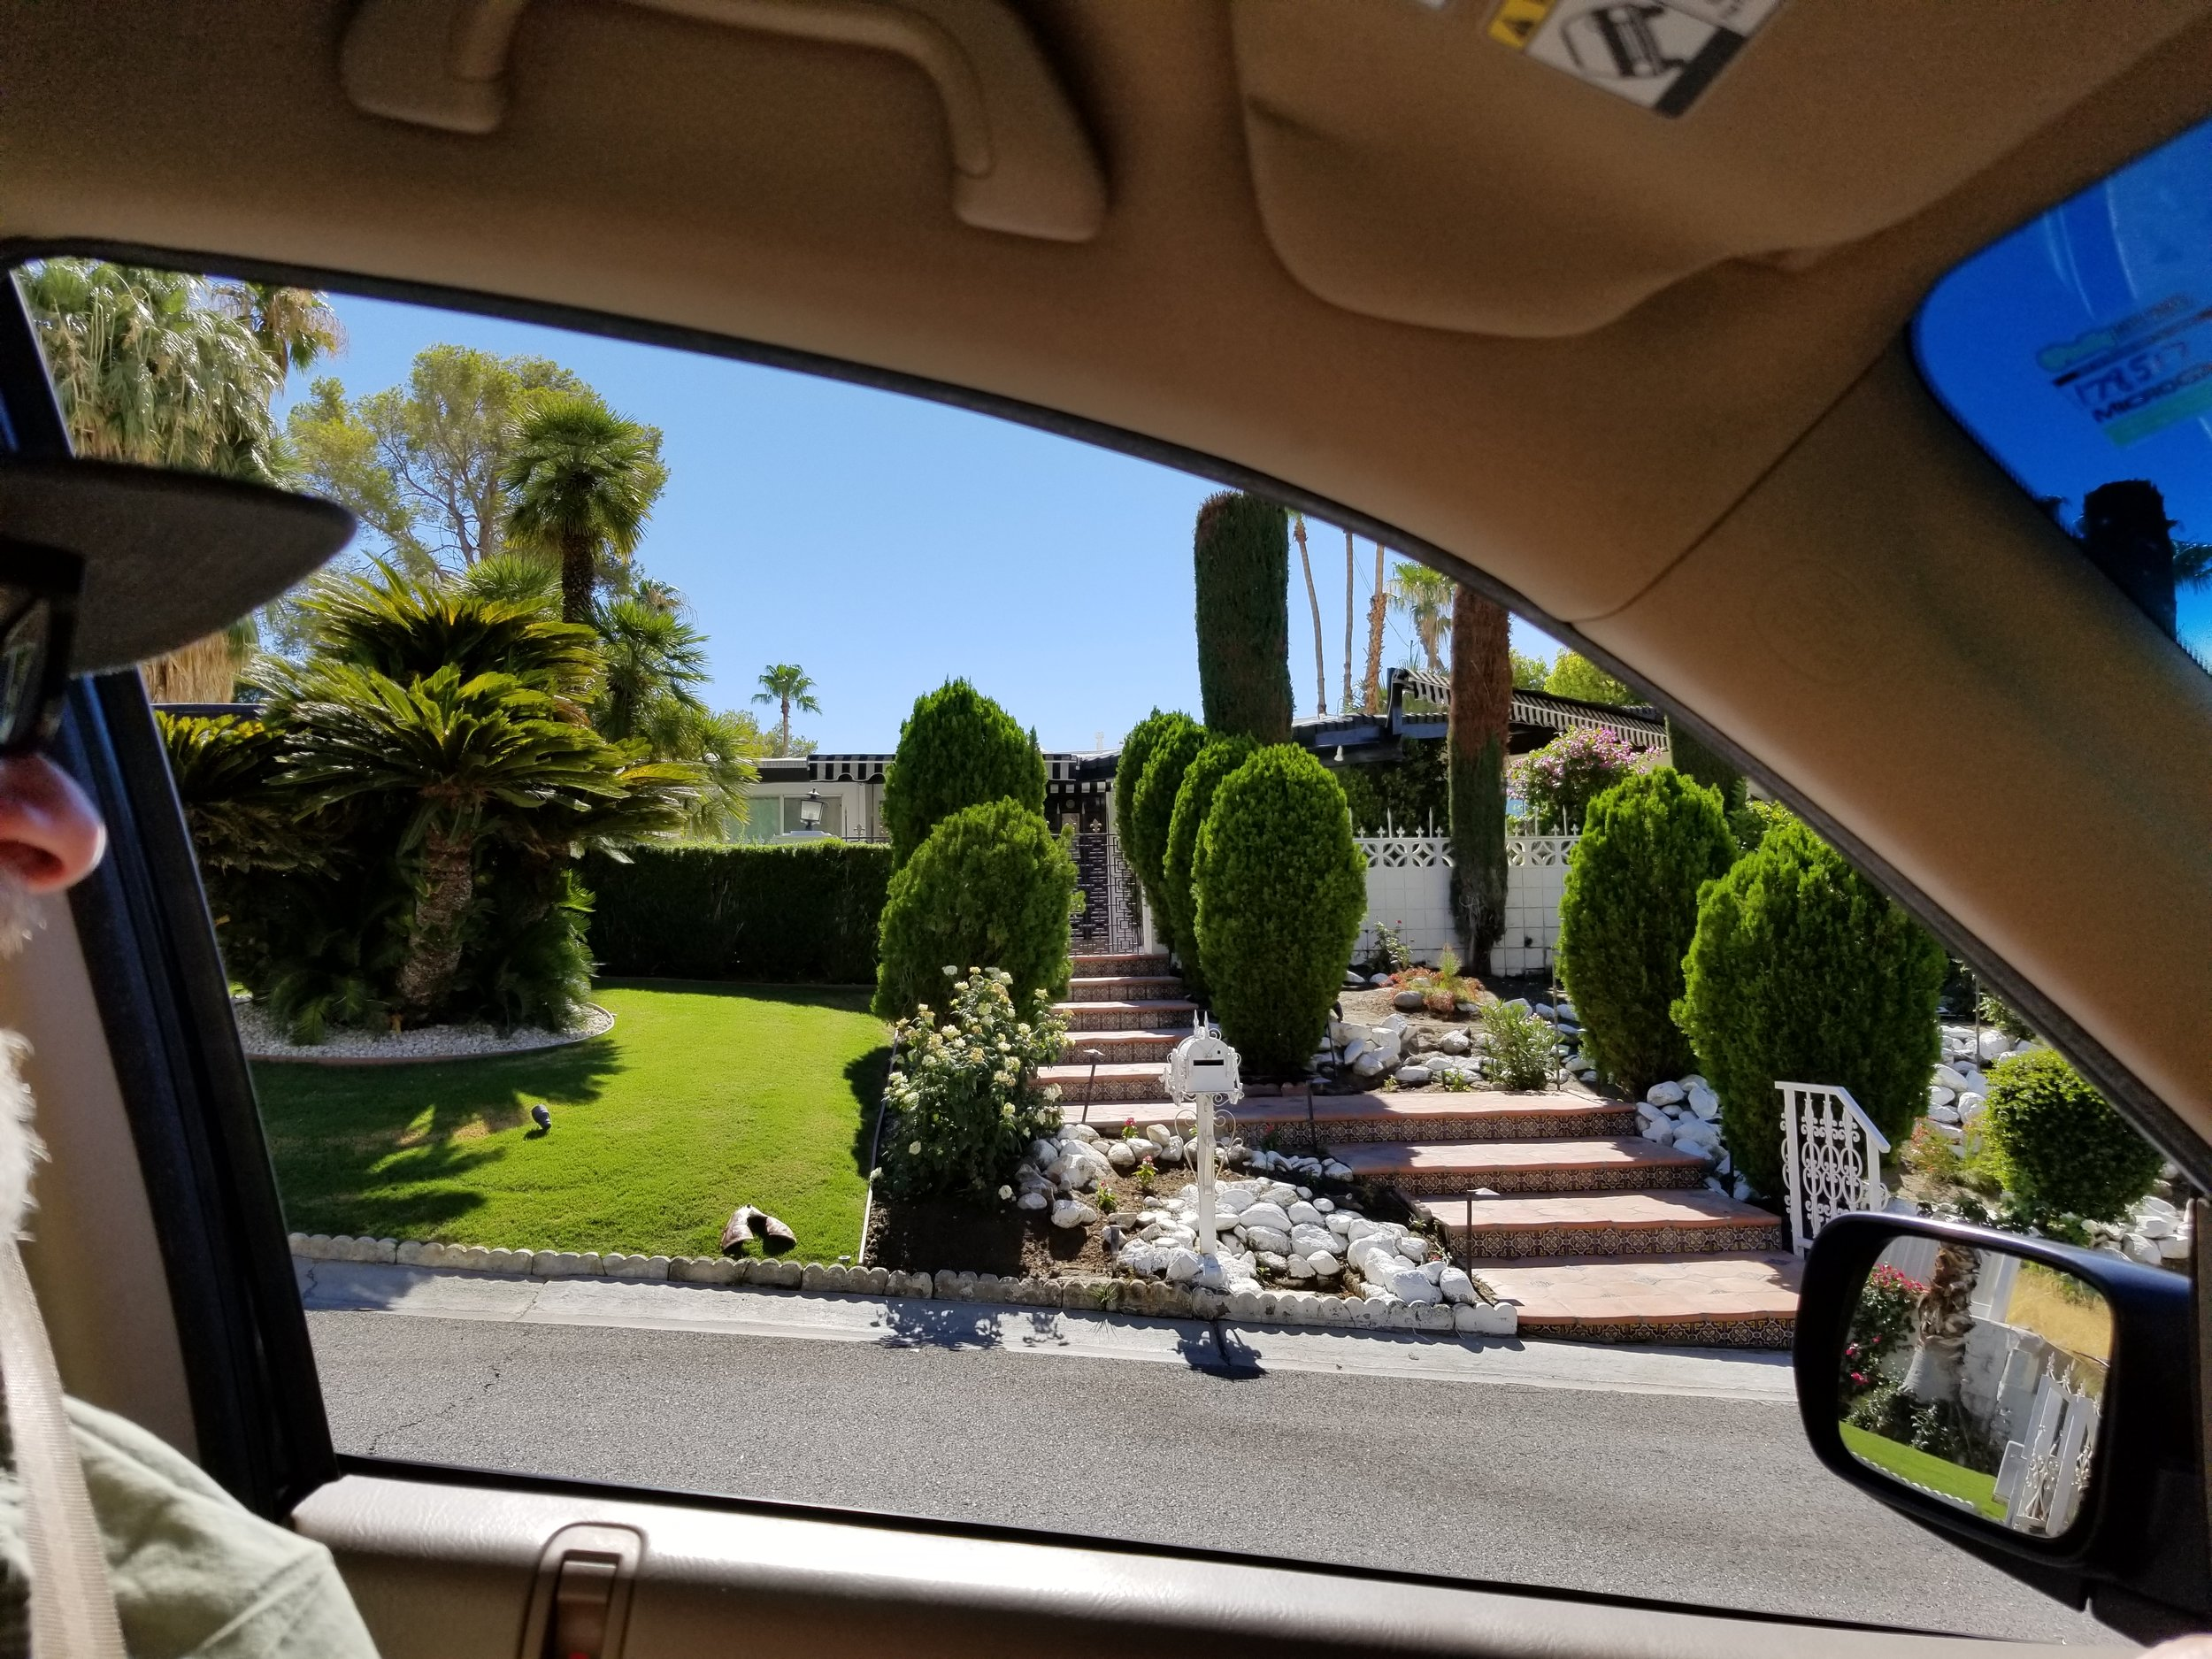 Marilyn Monroe's place, 1326 Rose Avenue, Palm Springs, California